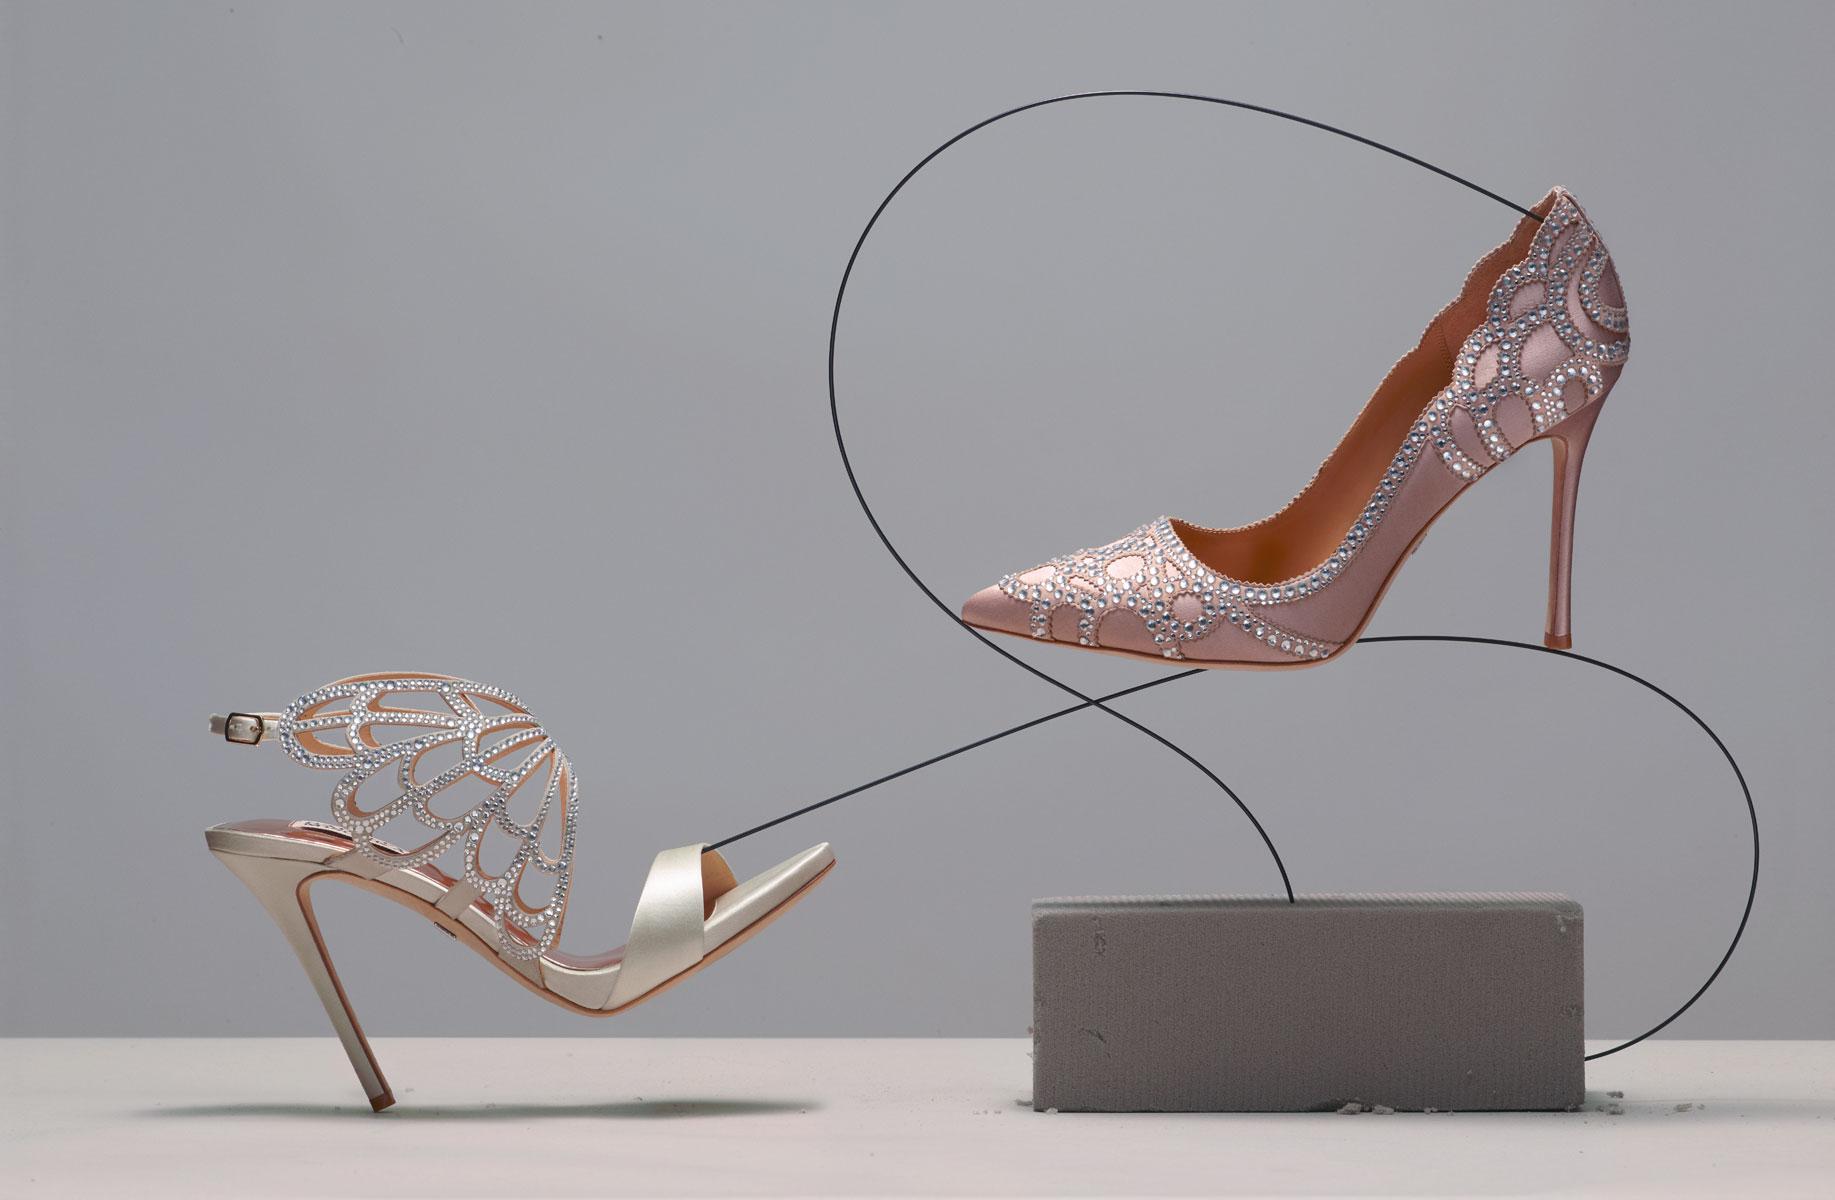 051116_25a_BM_shoes_03.jpg